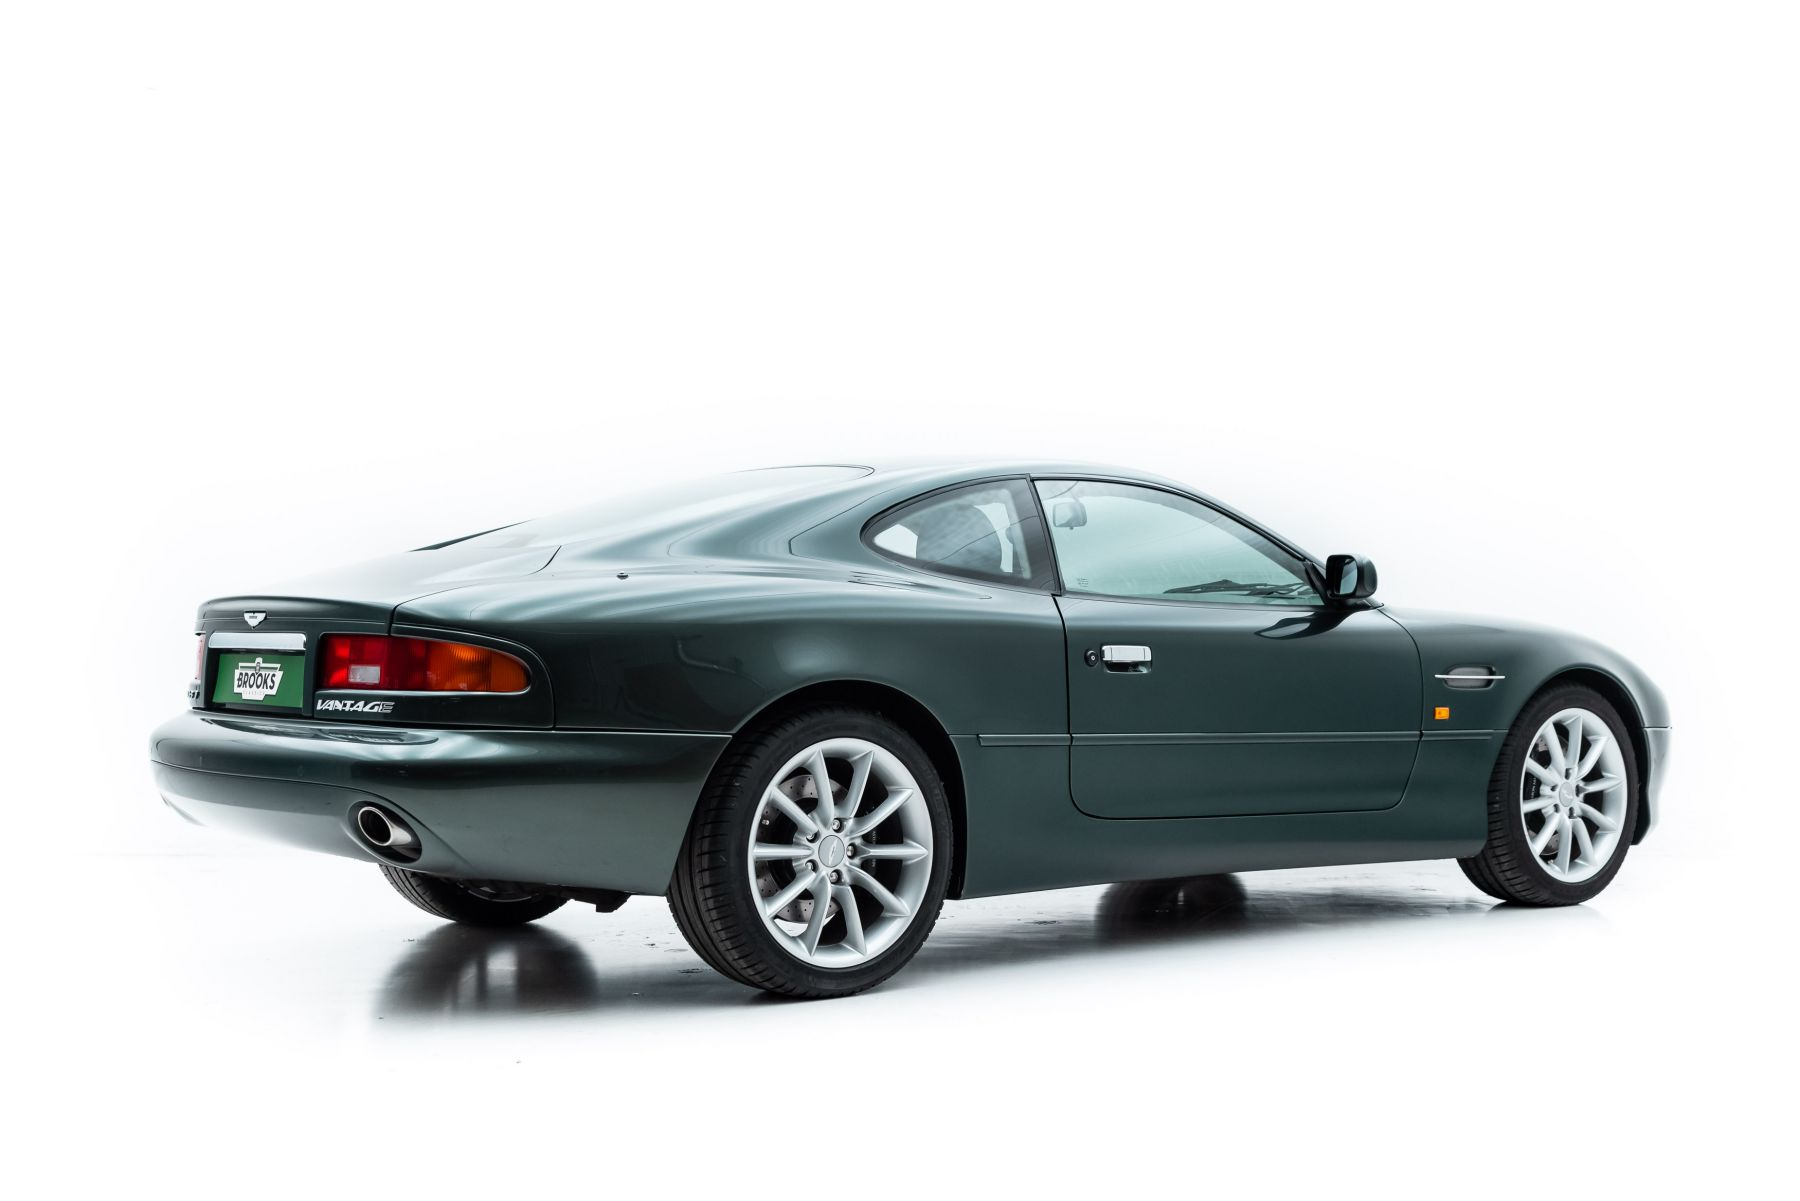 Aston Martin Db7 Vantage Manual For Sale Brooks Classics Klassiekers Youngtimers